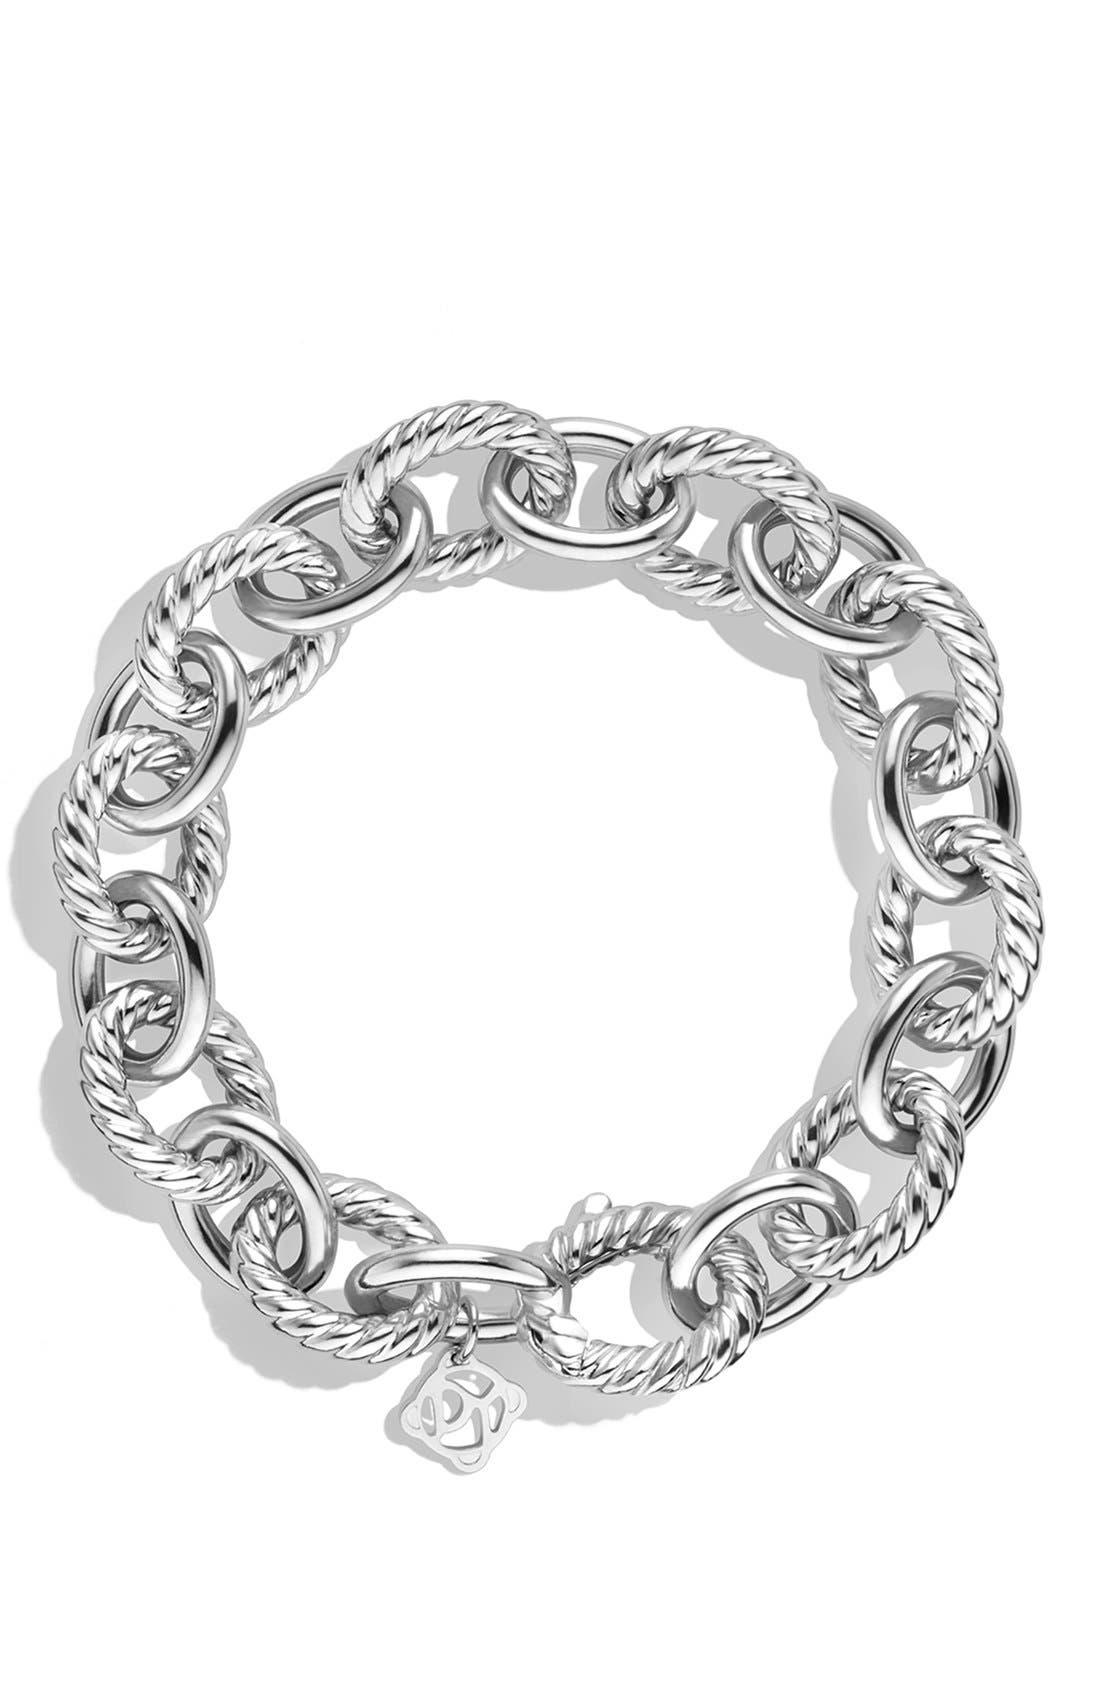 Alternate Image 2  - David Yurman 'Oval' Large Link Bracelet